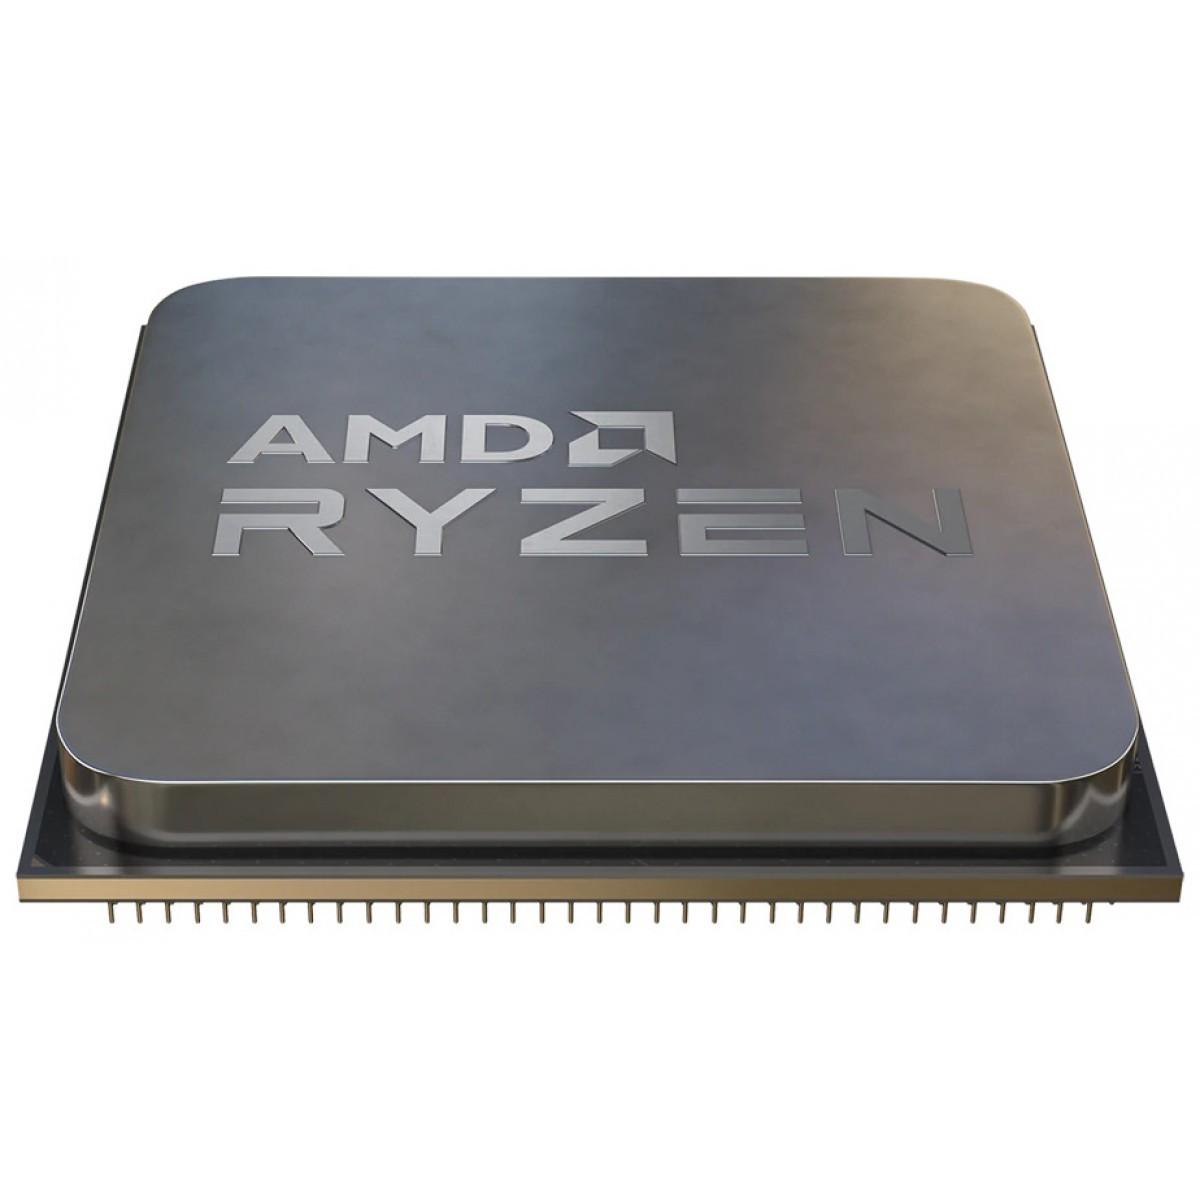 Processador AMD Ryzen 7 5700G 3.8GHz (4.6GHz Turbo), 8-Cores 16-Threads, Cooler Wraith Stealth, AM4, Com vídeo integrado, 100-100000263BOX